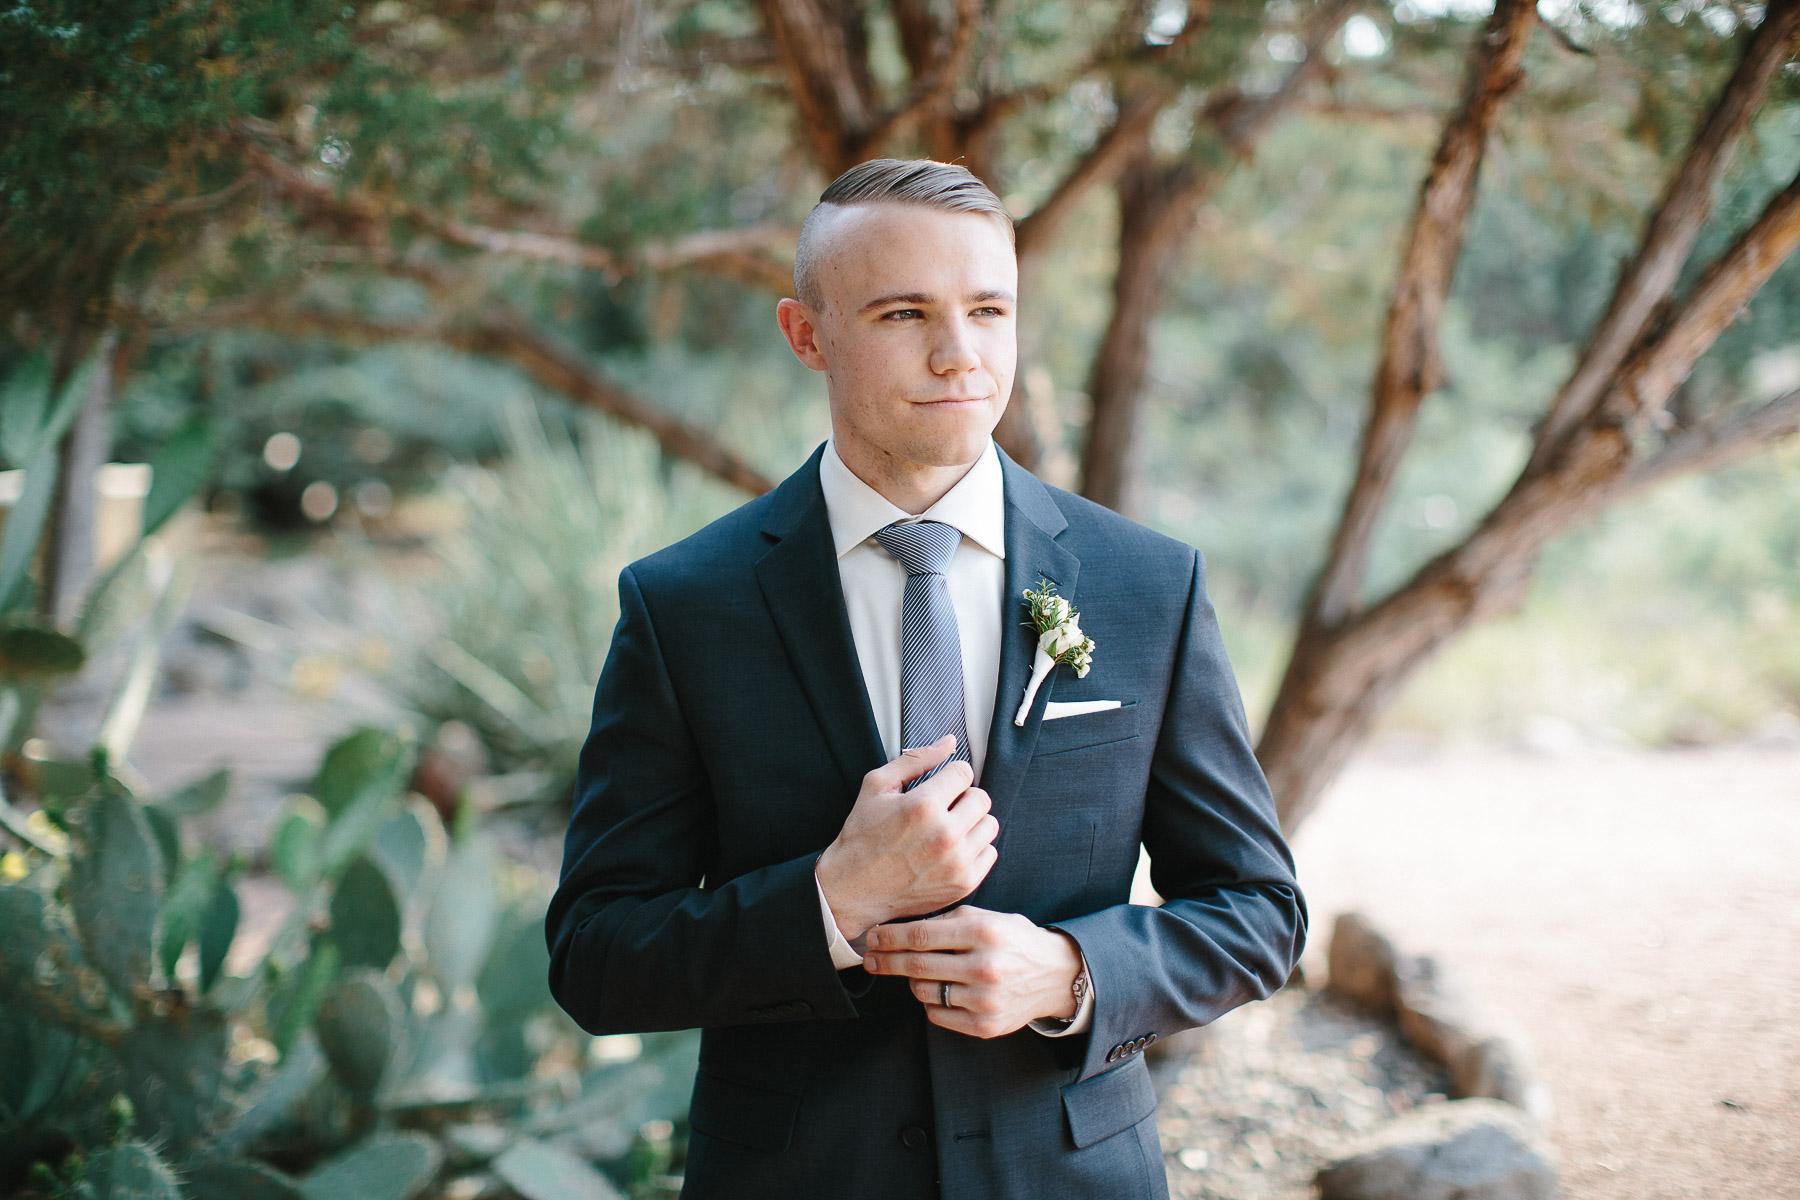 170528-Malkin-Wedding-Sedona-Arizona-Wedding-Photography-Sky-Ranch-Lodge-1023a.jpg